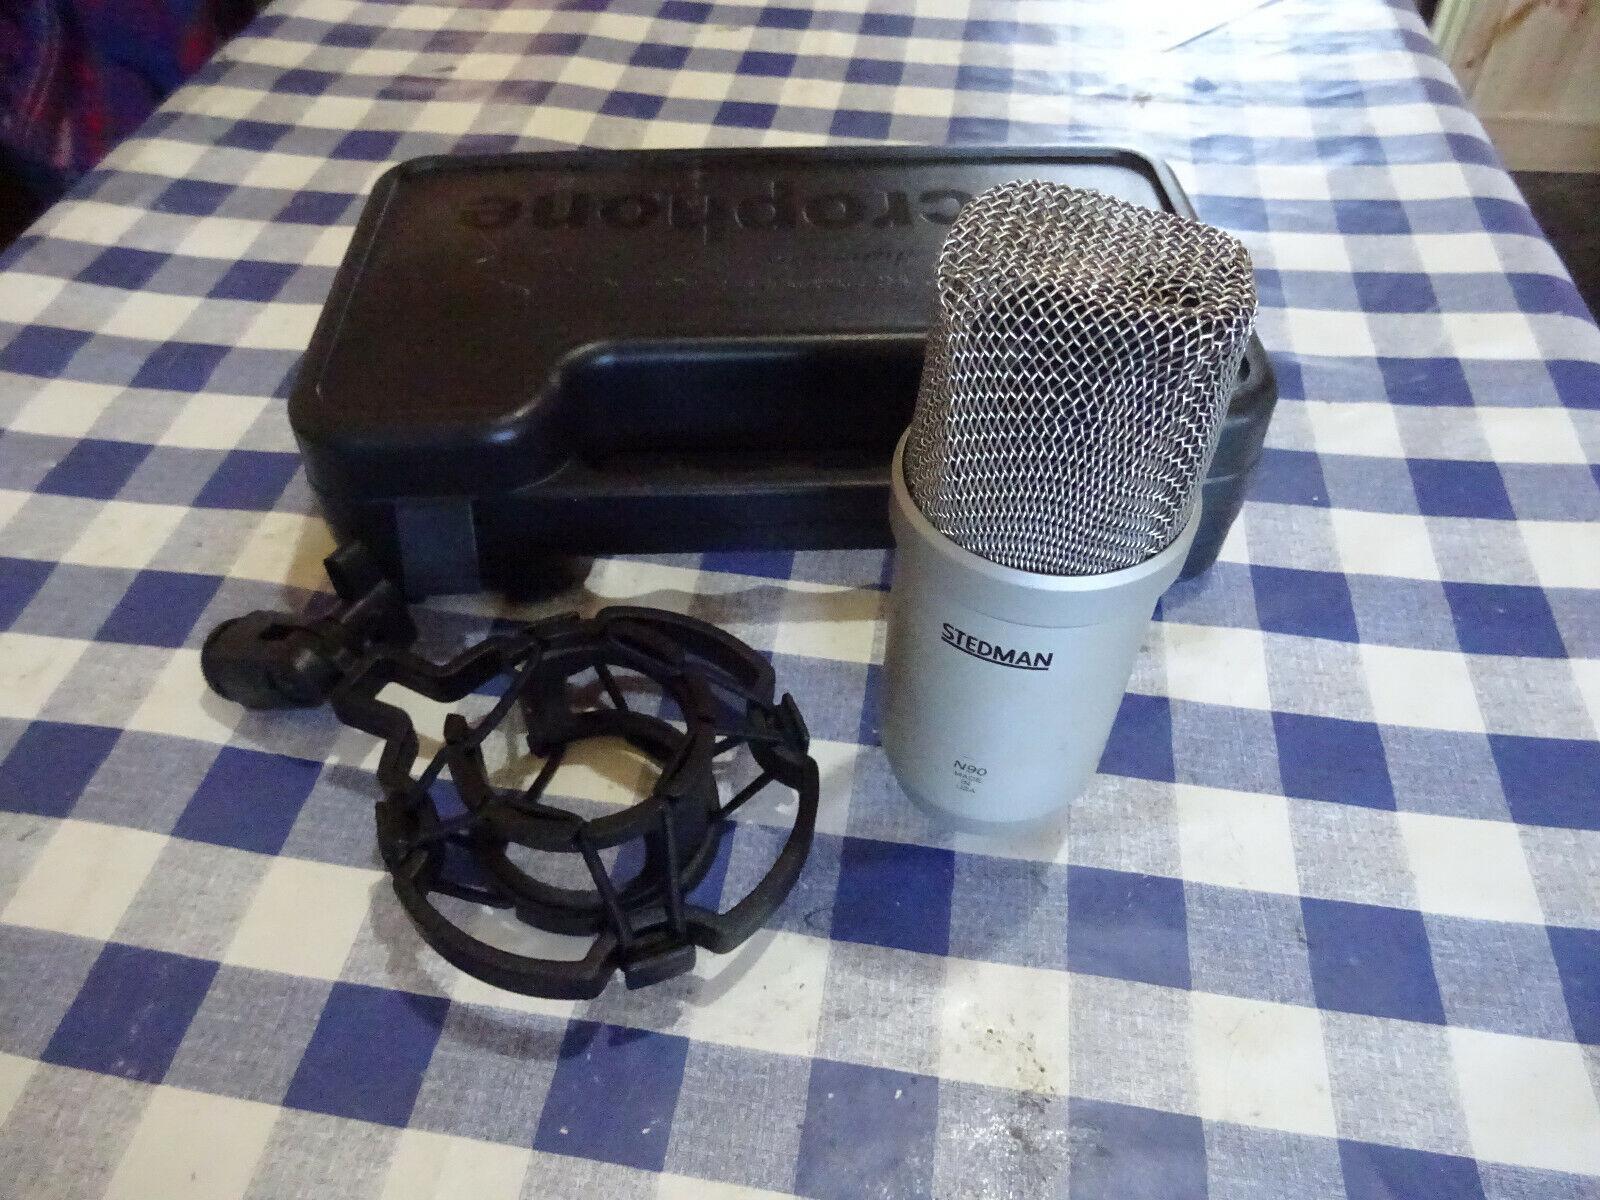 Stedman N90. Large Diaphragm Dynamic Microphone. Hand Made in USA.